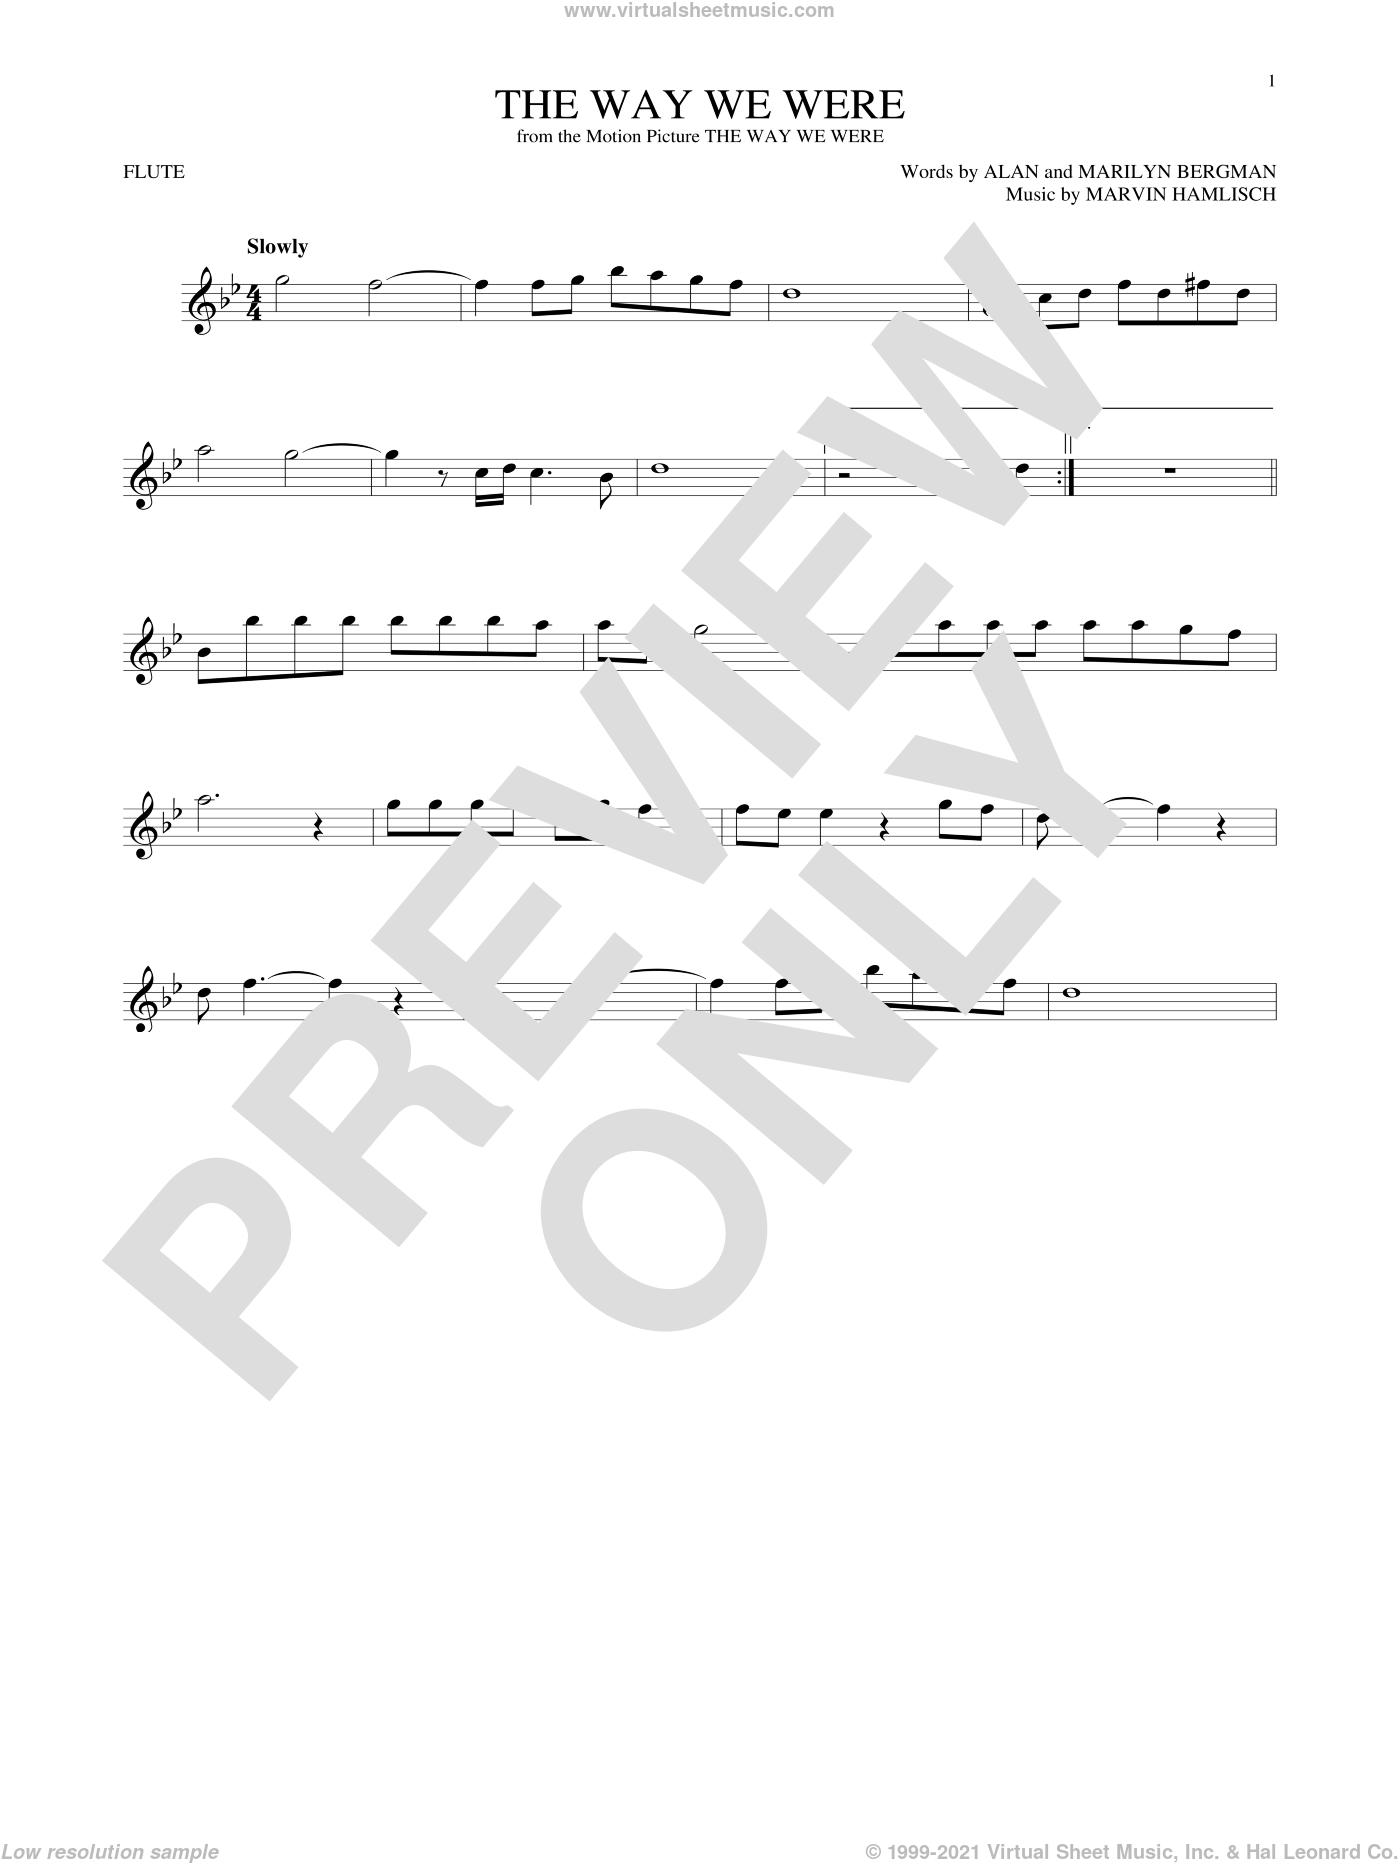 The Way We Were sheet music for flute solo by Barbra Streisand, Alan Bergman, Marilyn Bergman and Marvin Hamlisch, intermediate skill level